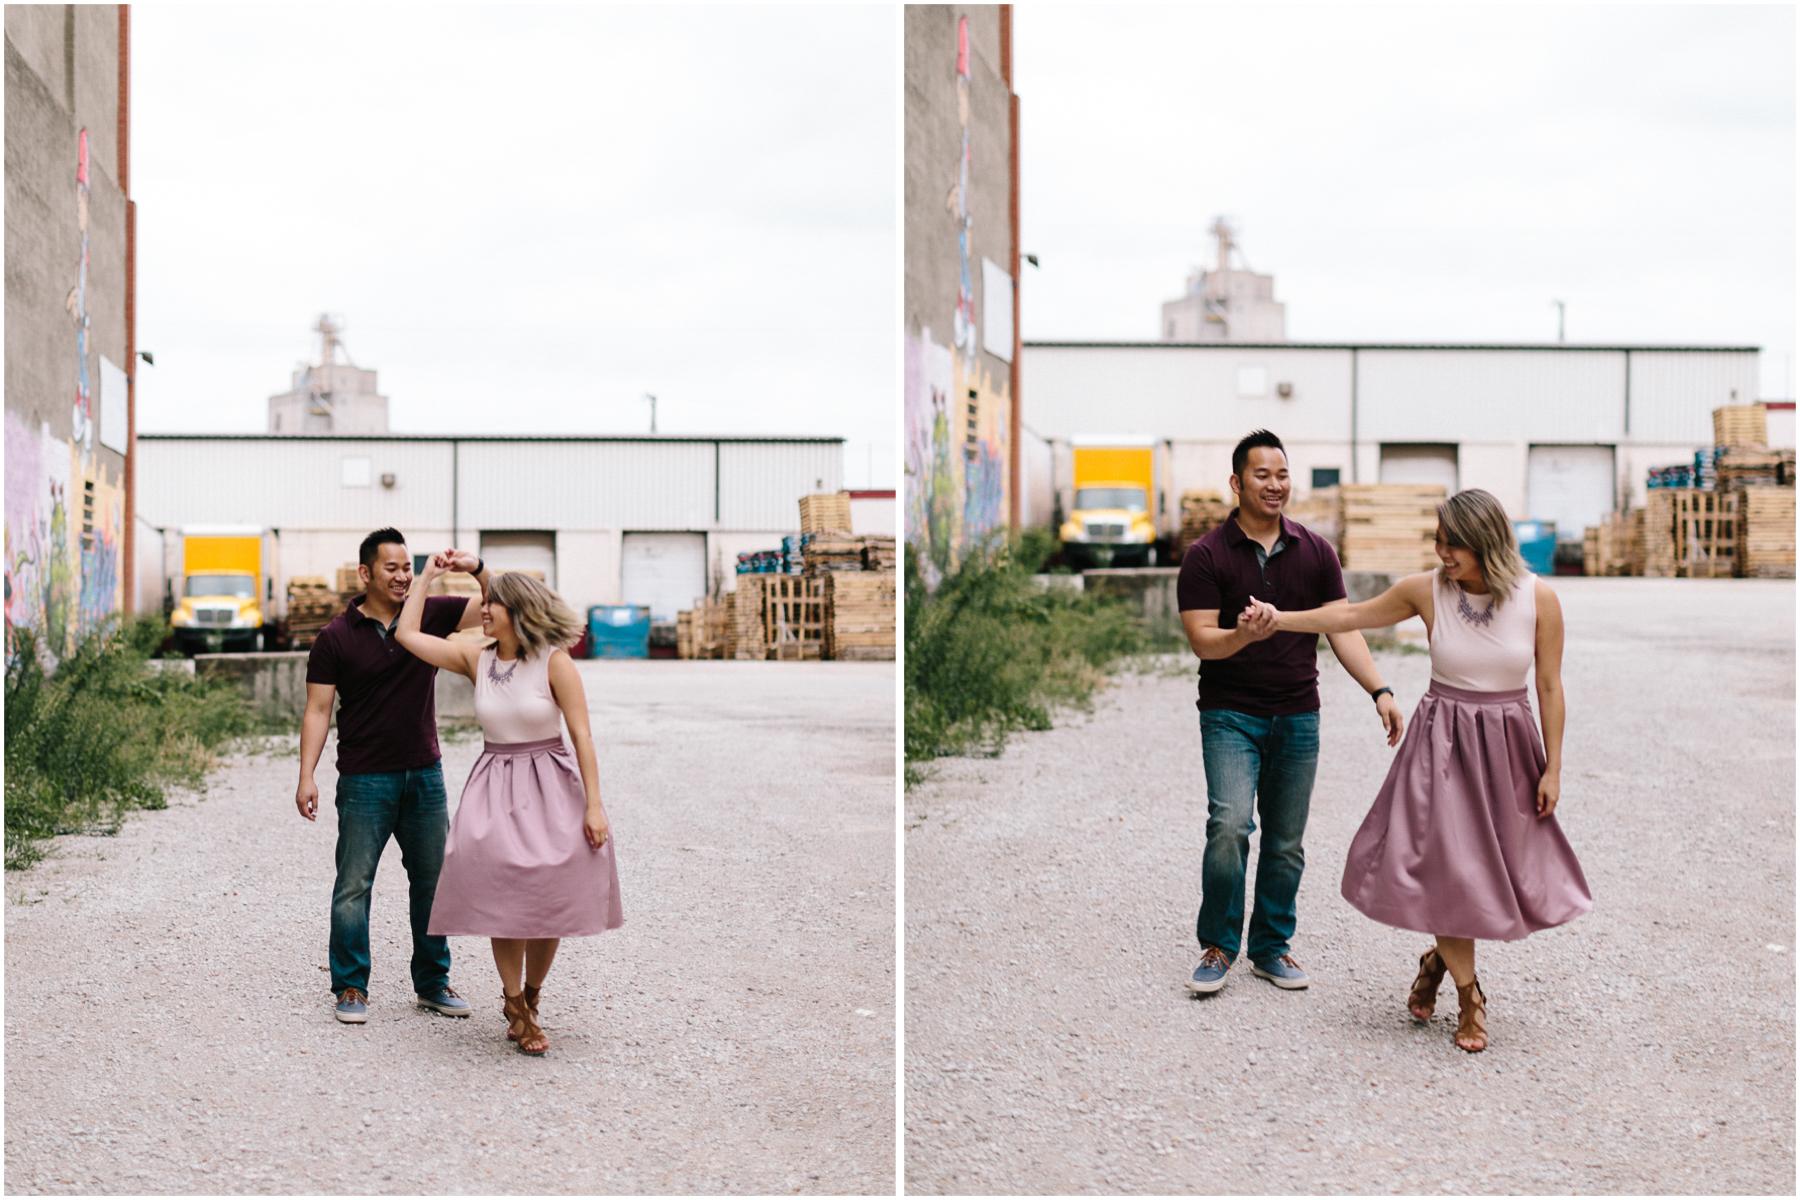 alyssa barletter photography loose park west bottoms engagement session dogs-14.jpg